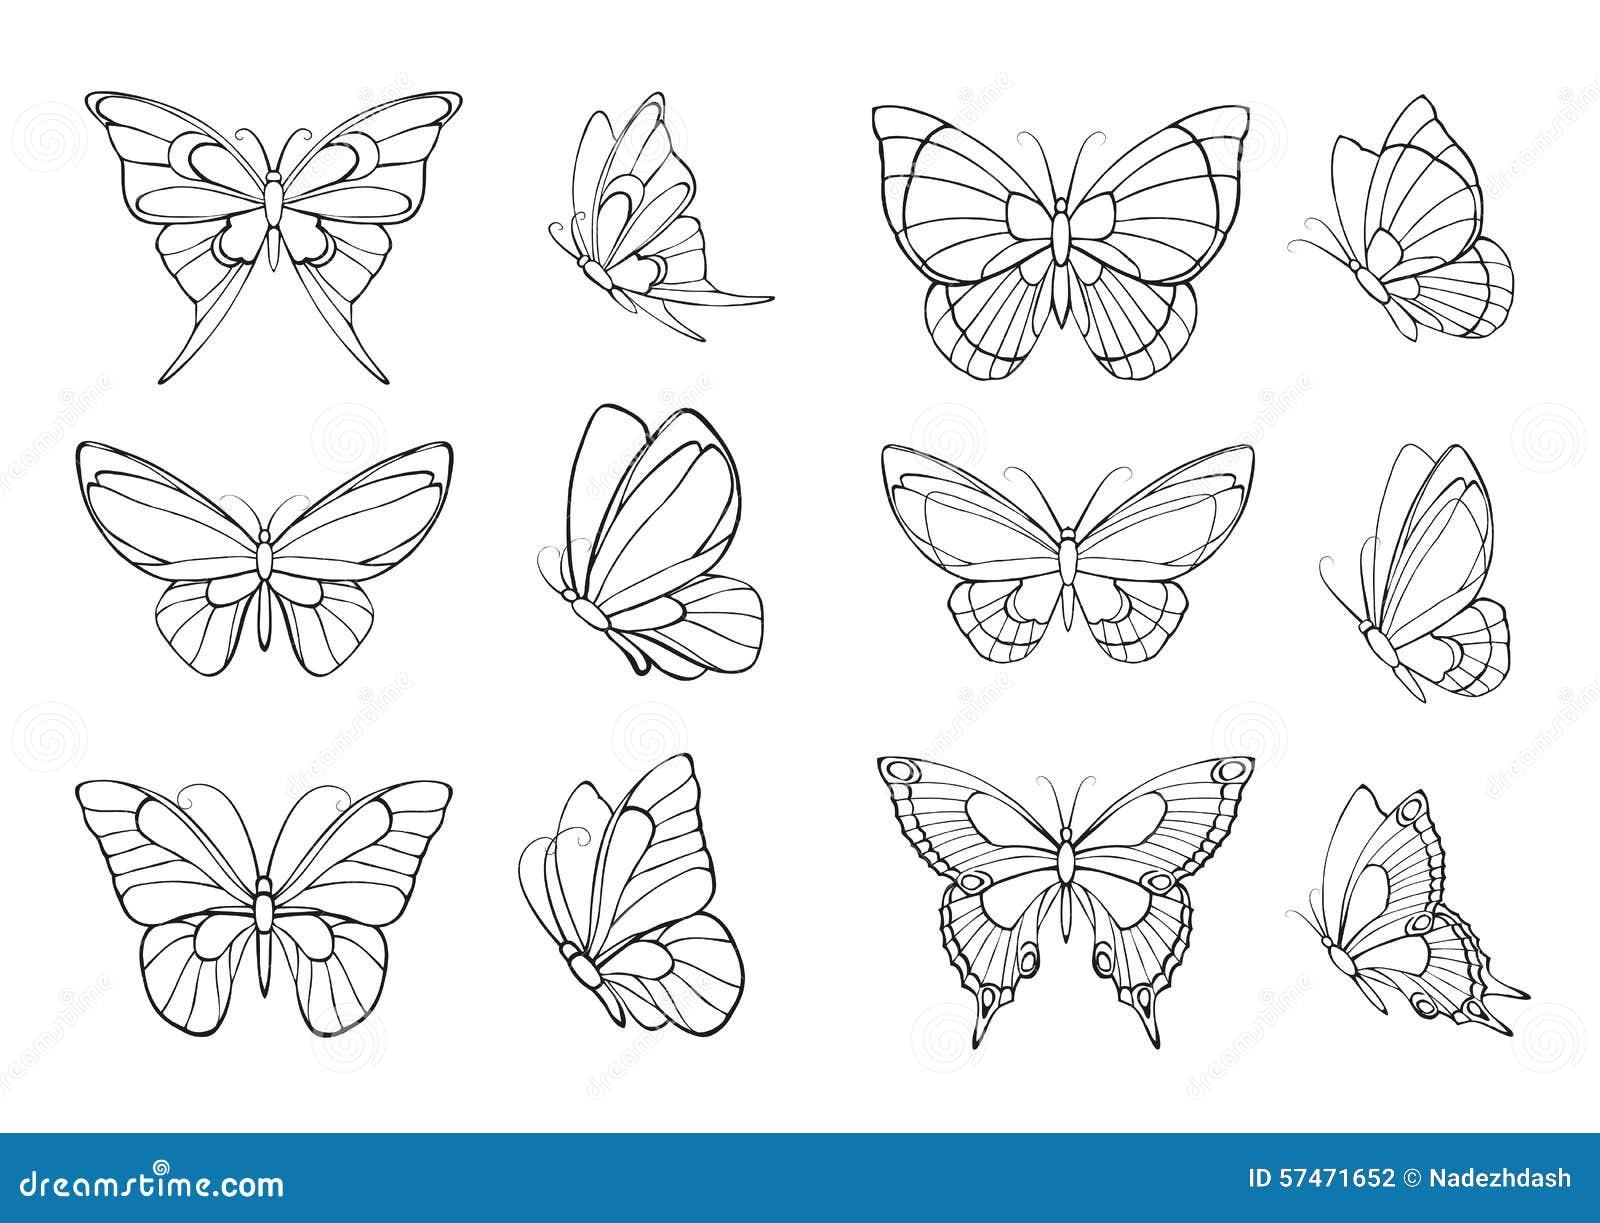 Рисуем бабочек карандашом картинки